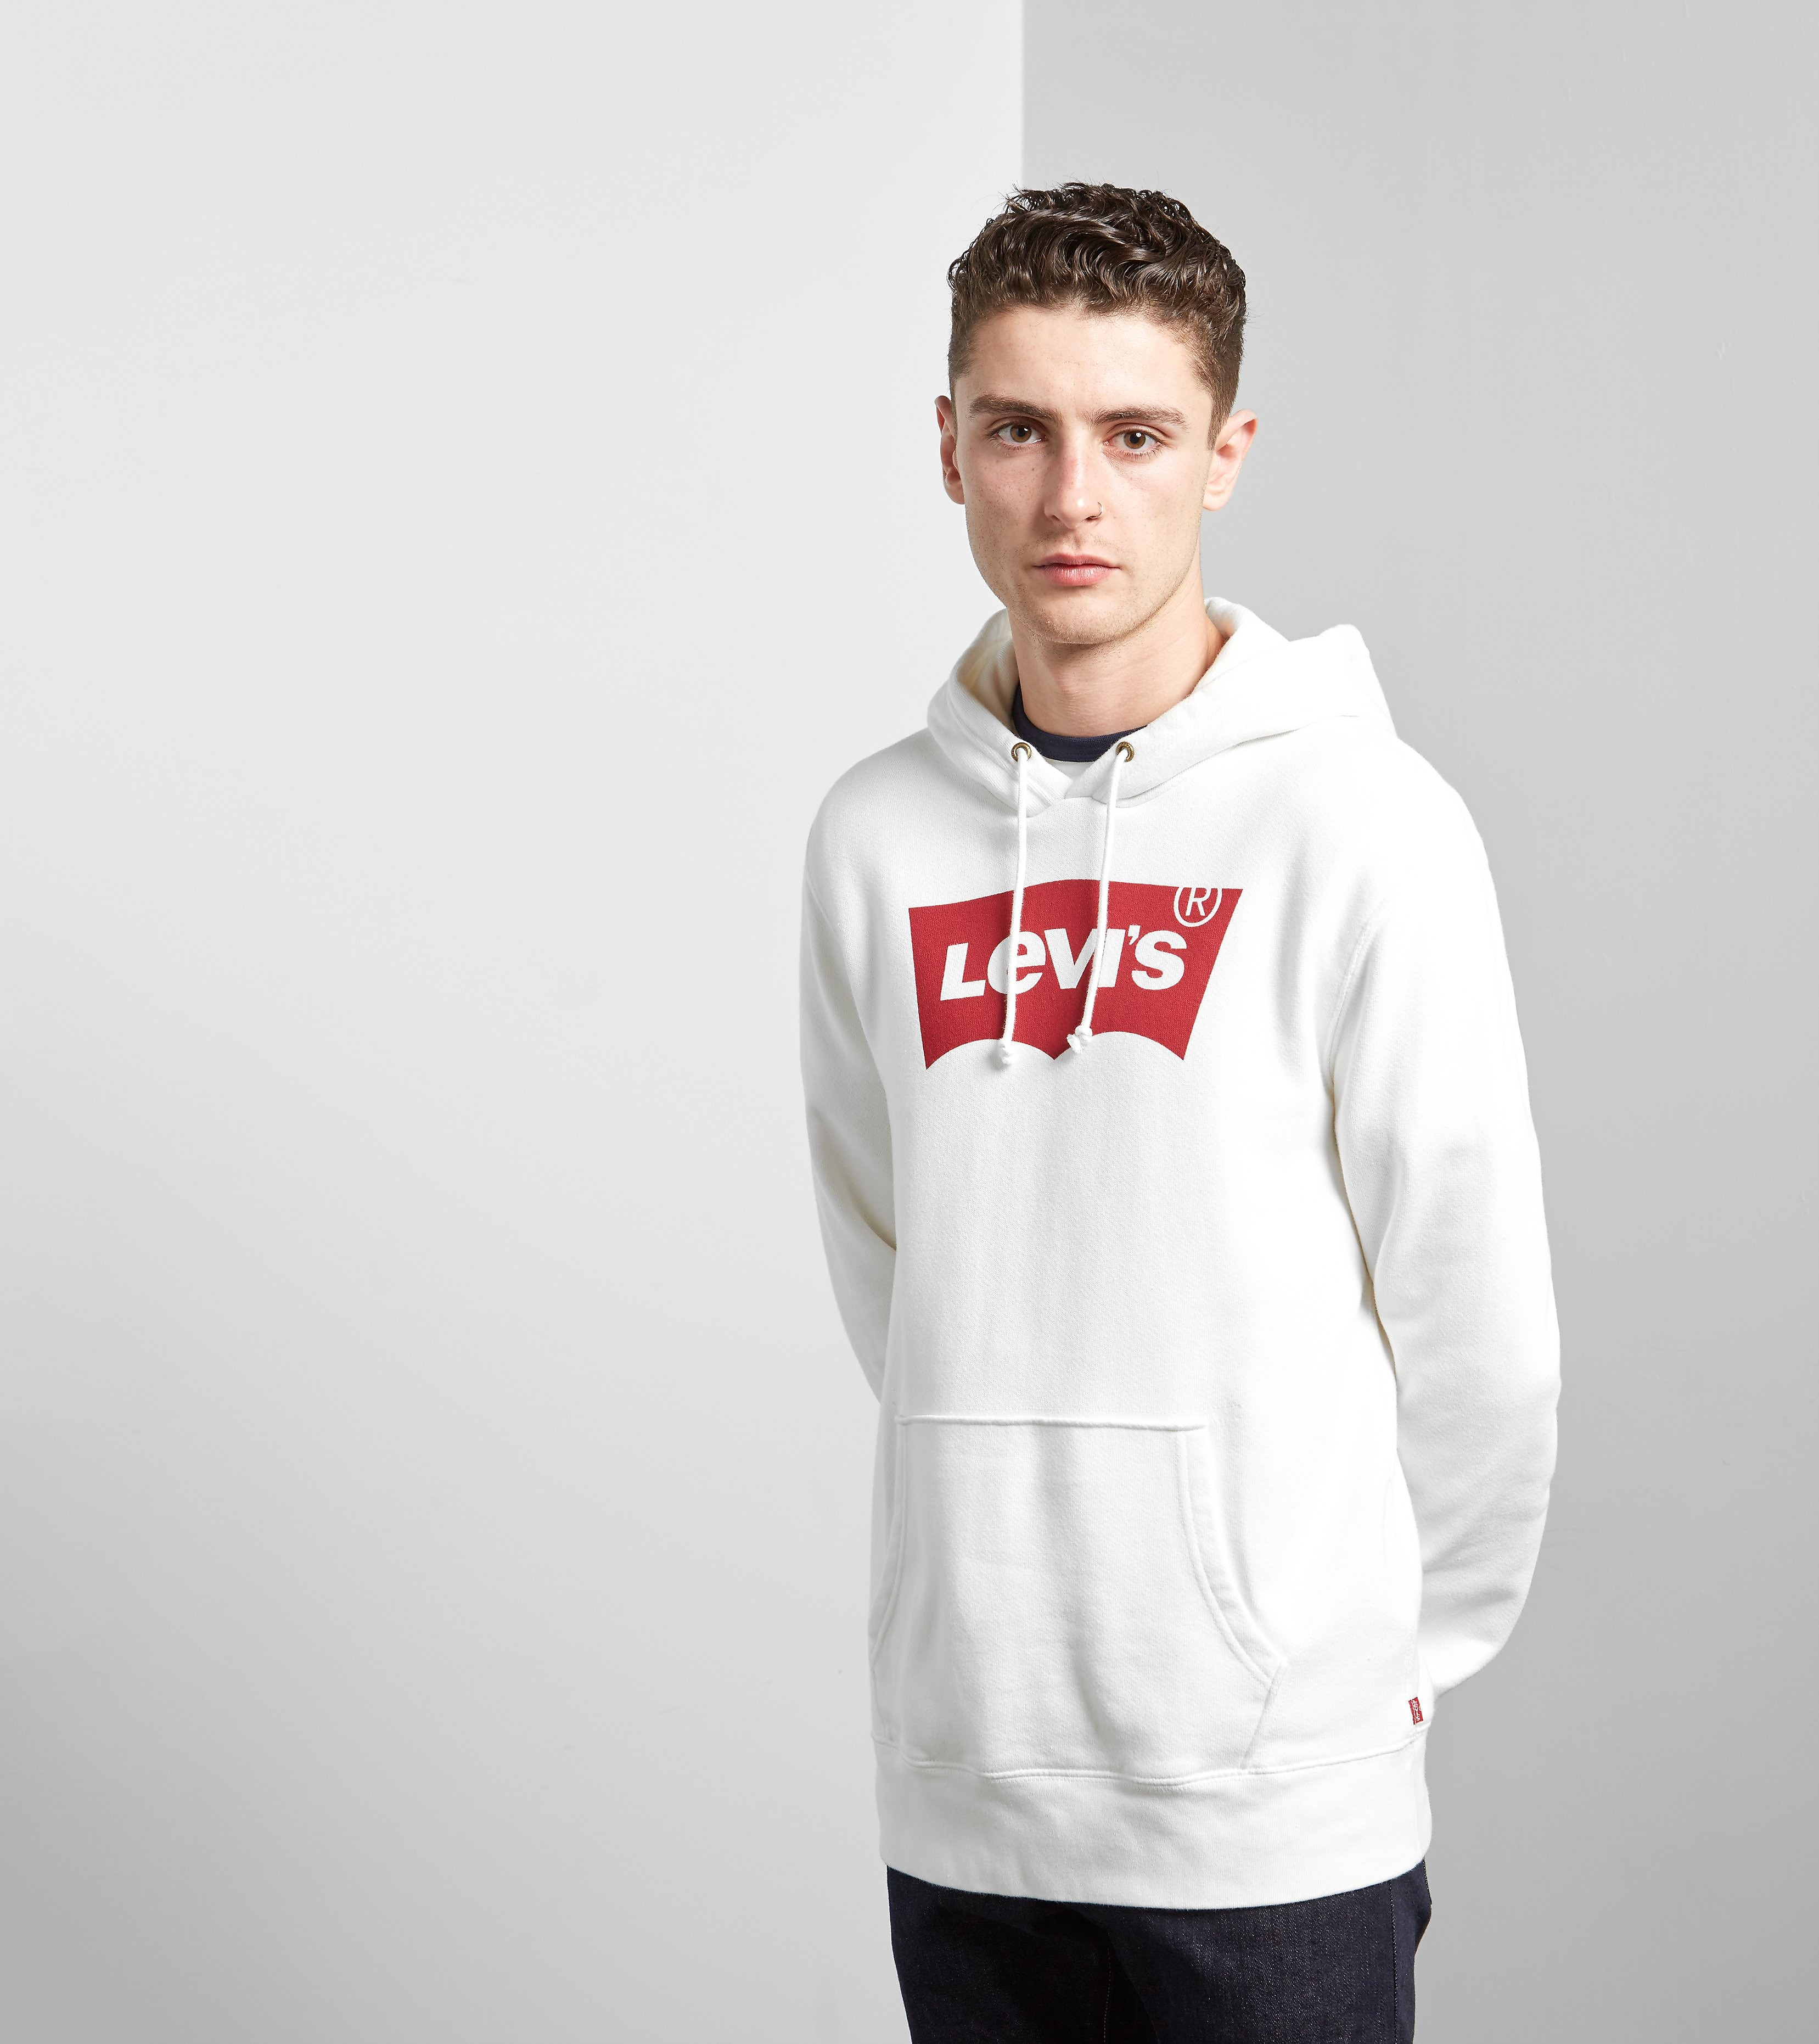 Levis Batwing Logo Hoody